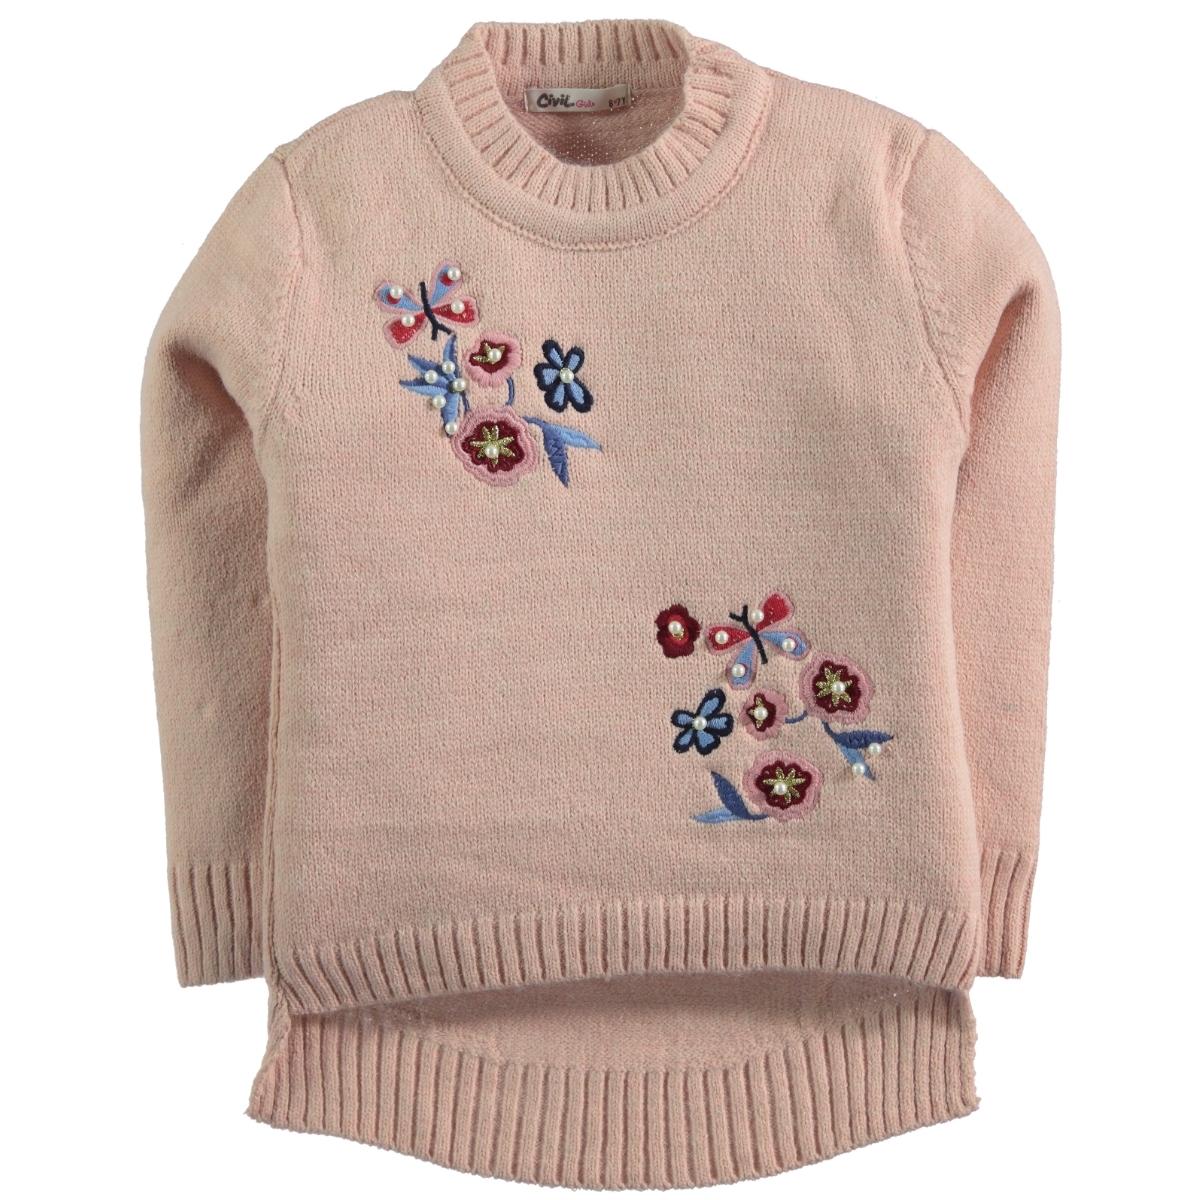 Civil Girls The Powder Pink Sweater Girl Age 6-9